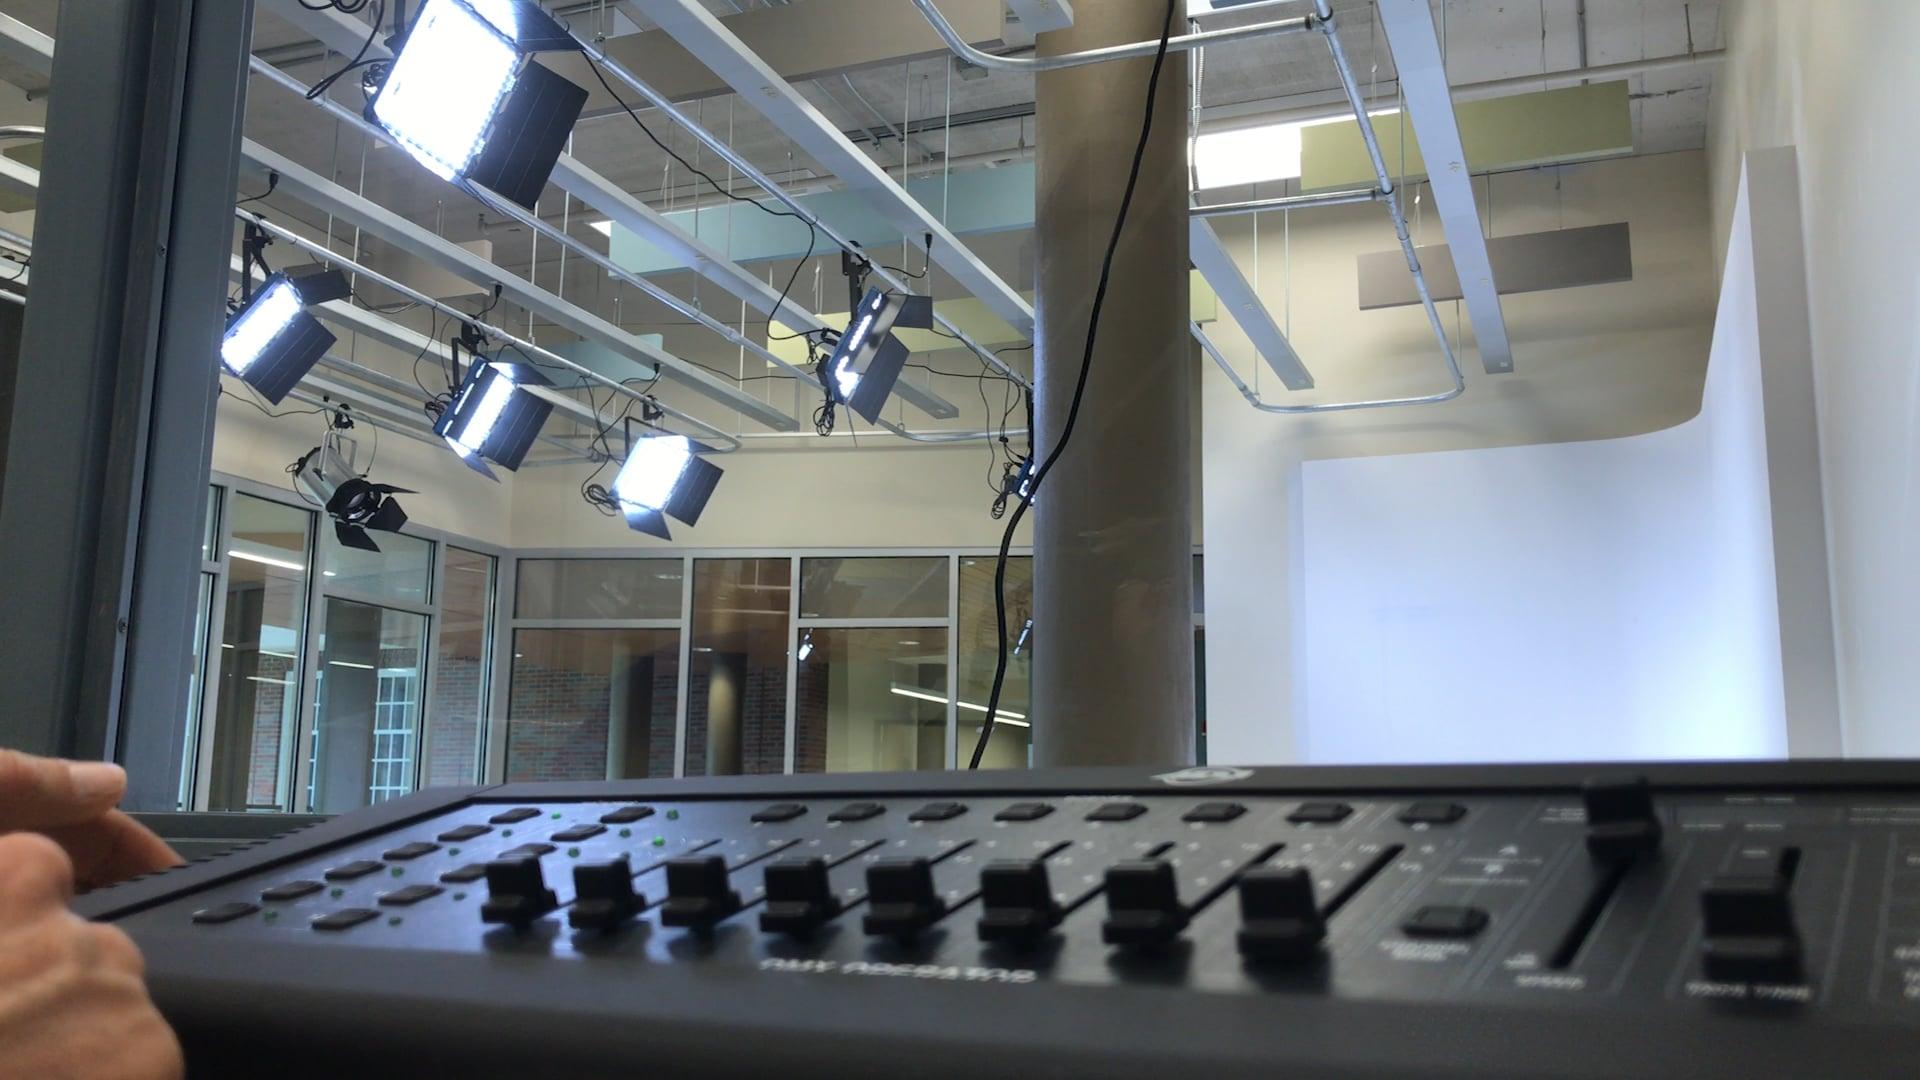 Ohio University Zabolight Installation #2